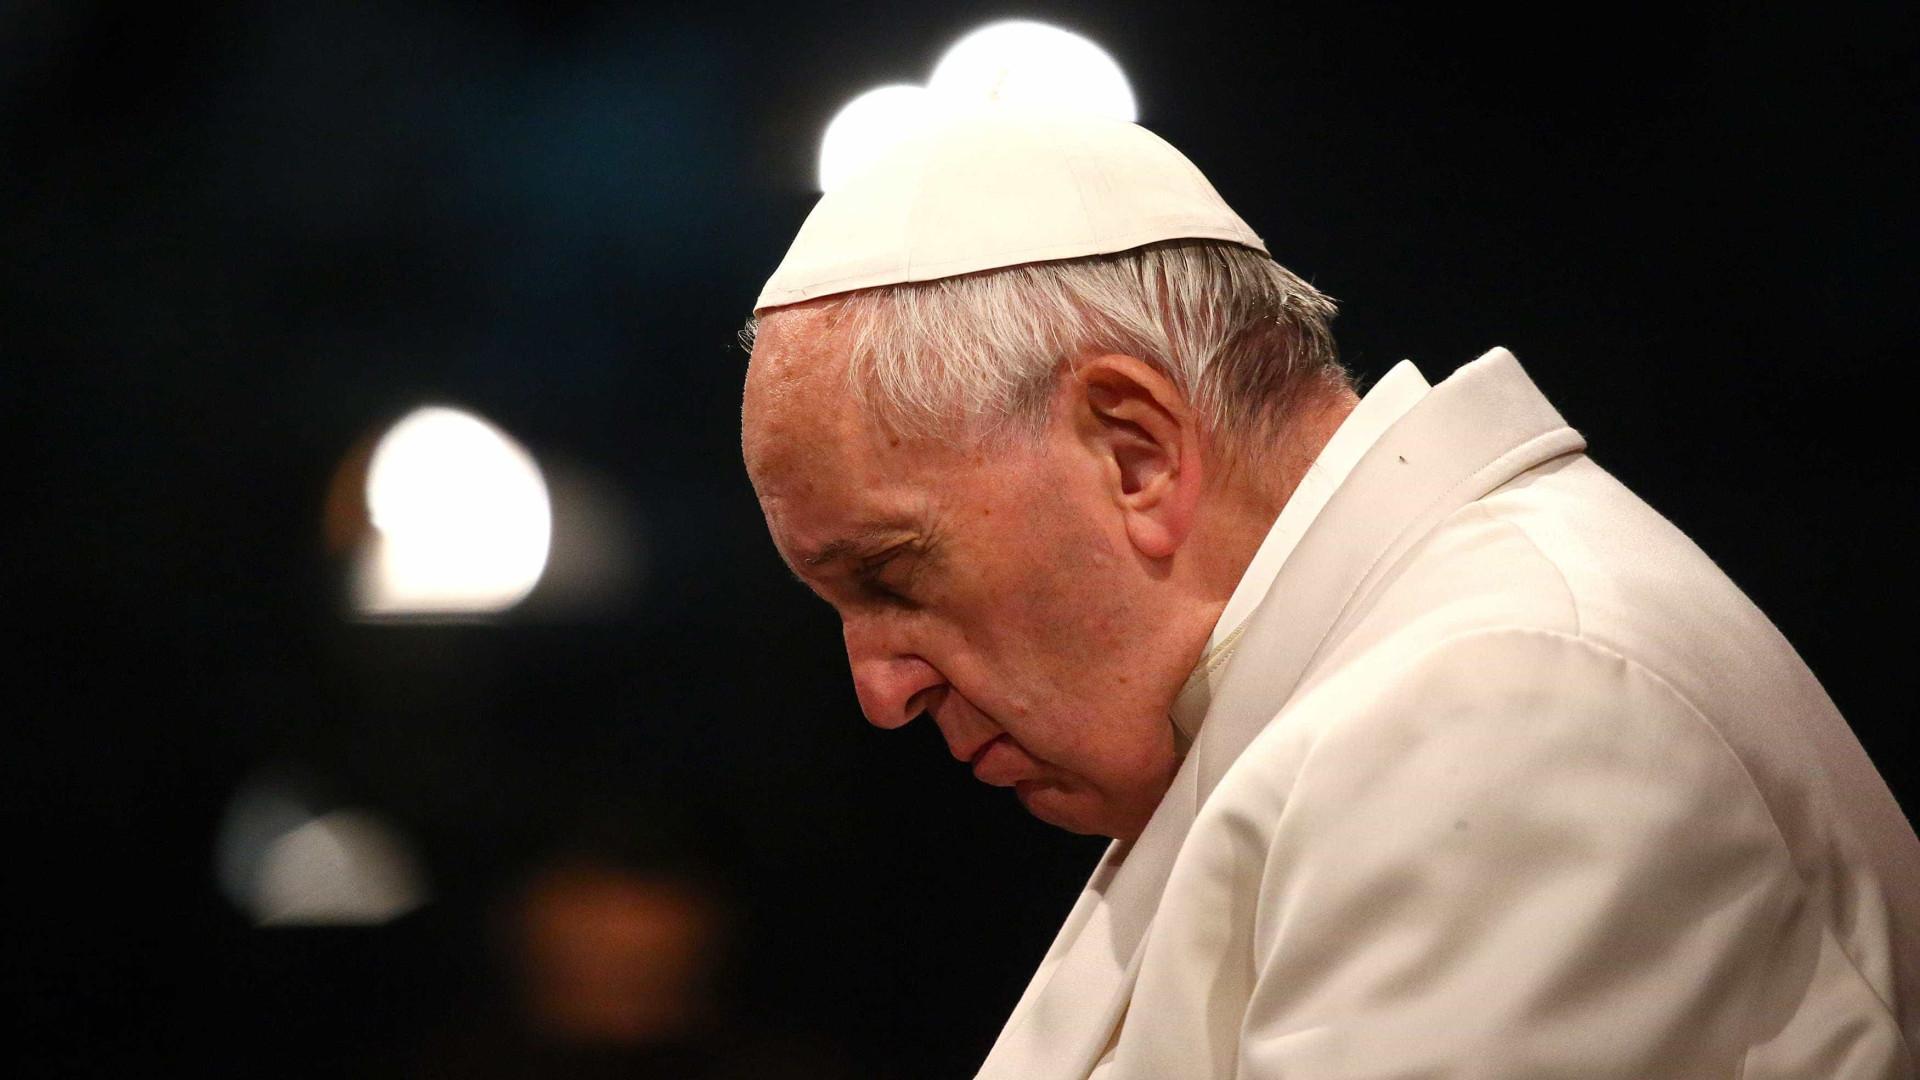 Mais de 60 conservadores acusam Papa Francisco de 'heresias'